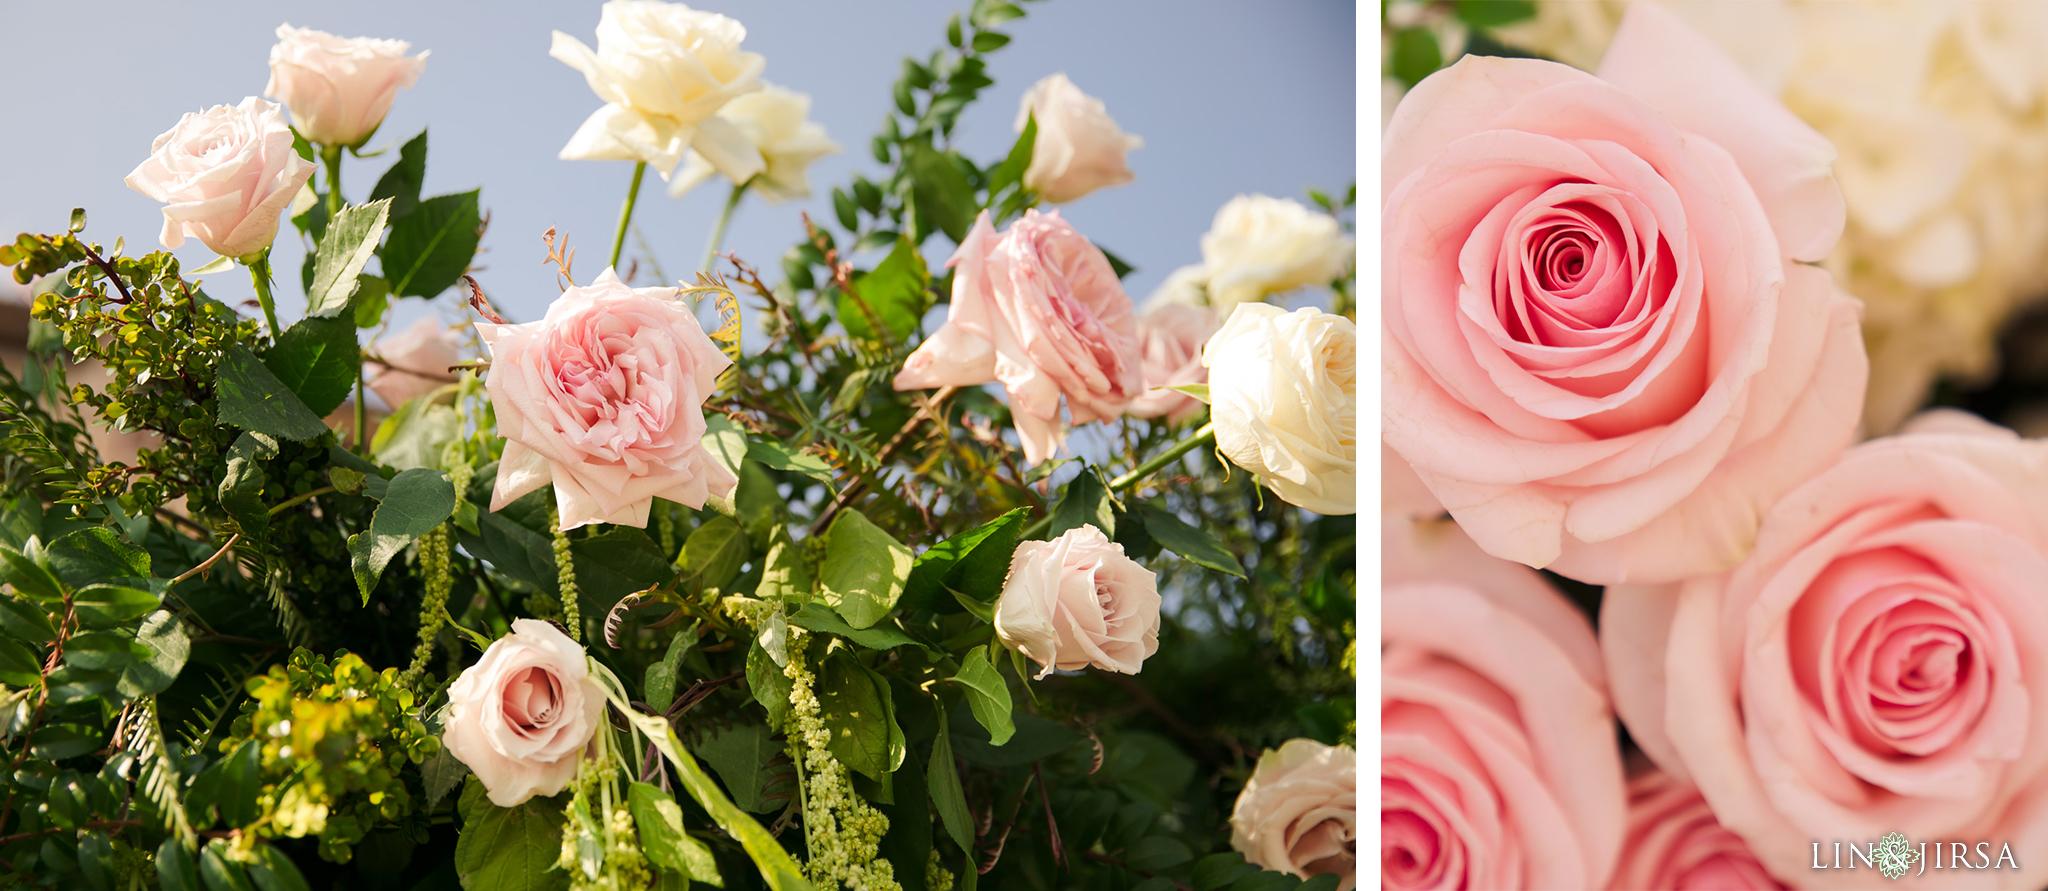 13 Langham Pasadena Multicultural Wedding Photography